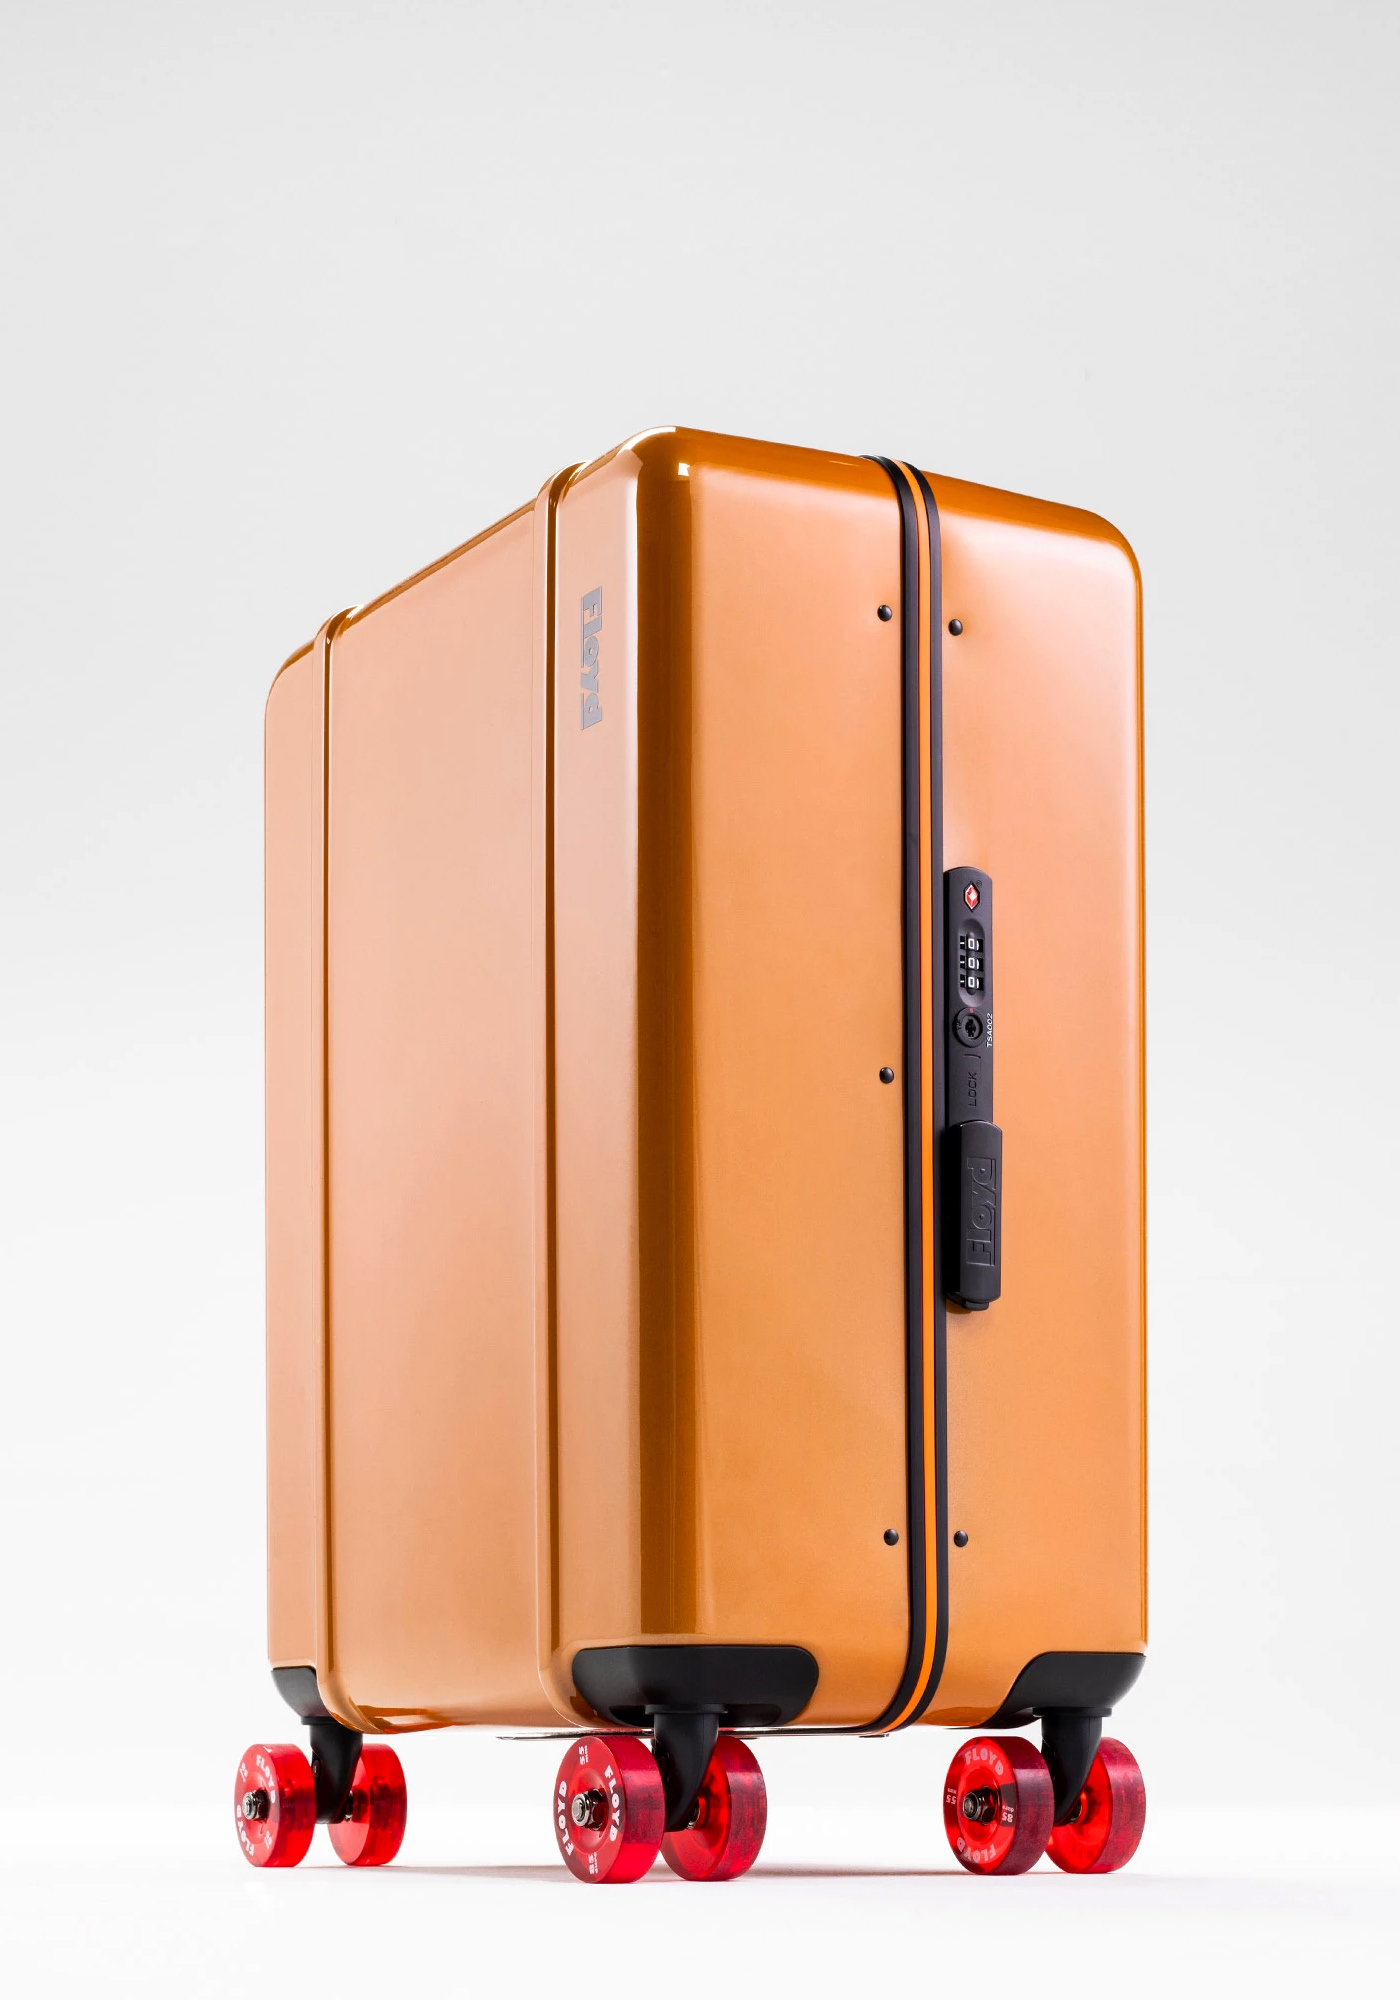 Floyd Valises Californie Travel Case Cabin Sunset Orange